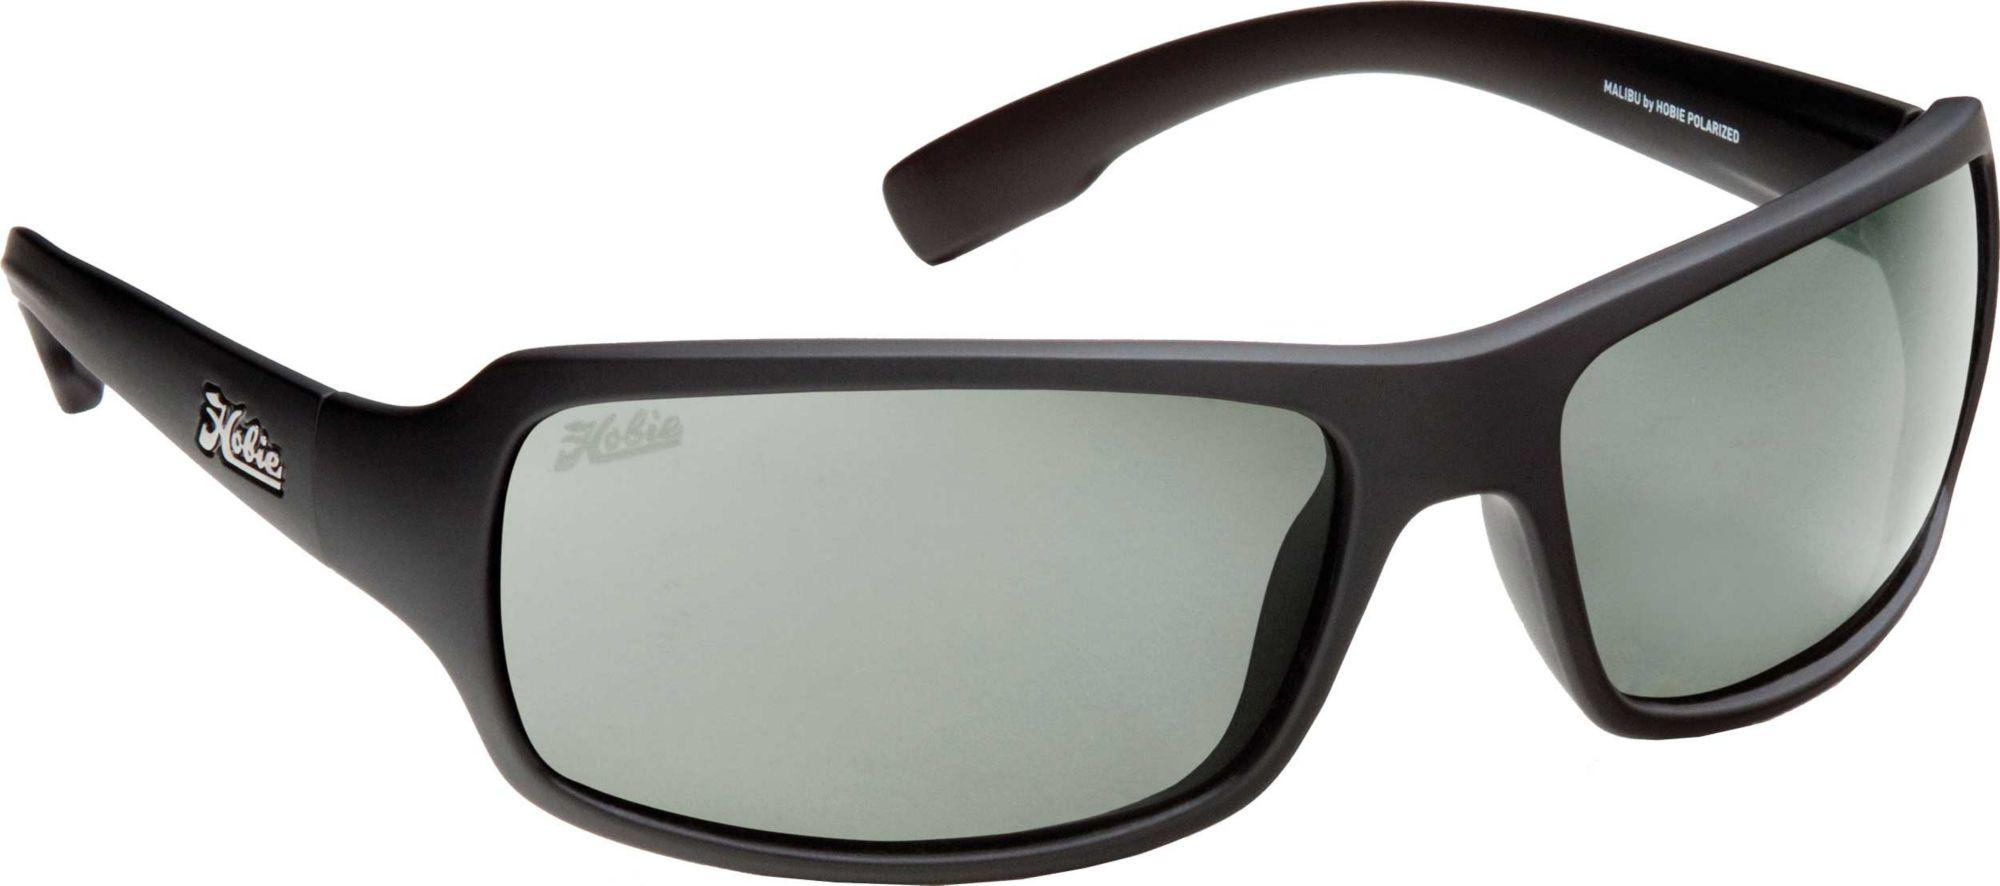 d5d3636447 Lyst - Hobie Malibu Polarized Sunglasses in Black for Men